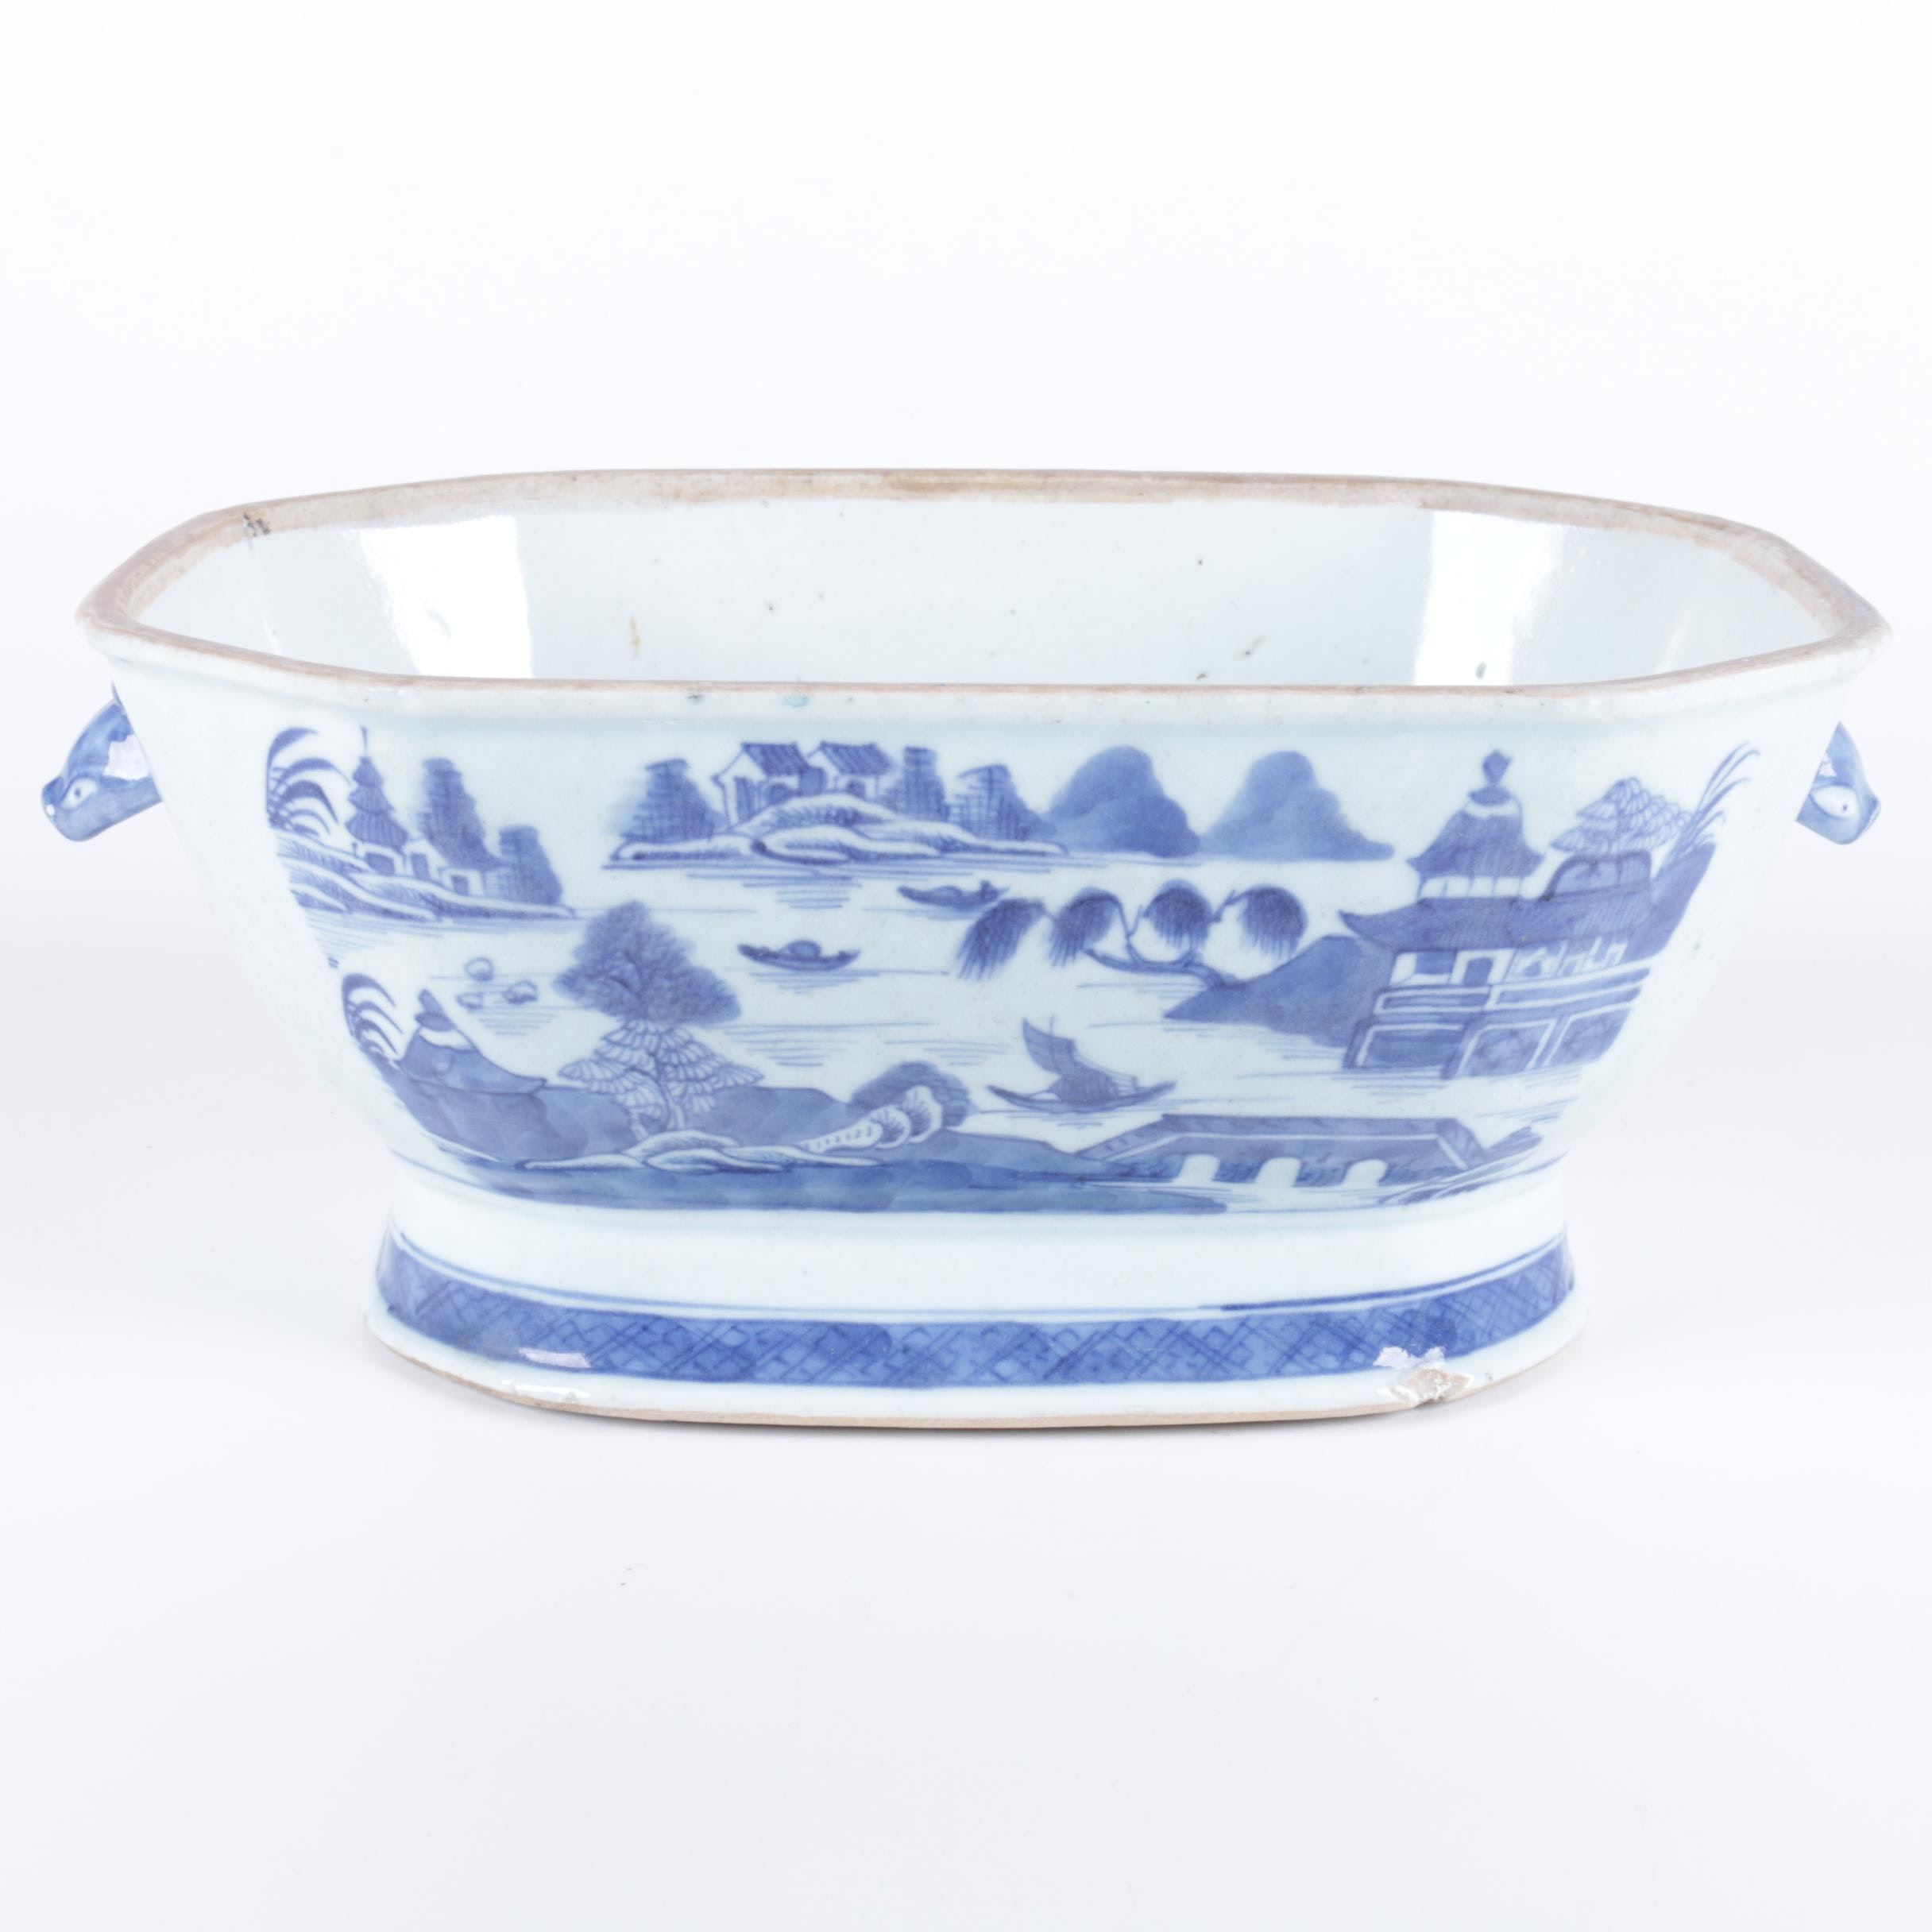 Chinese Inspired Blue and White Ceramic Planter